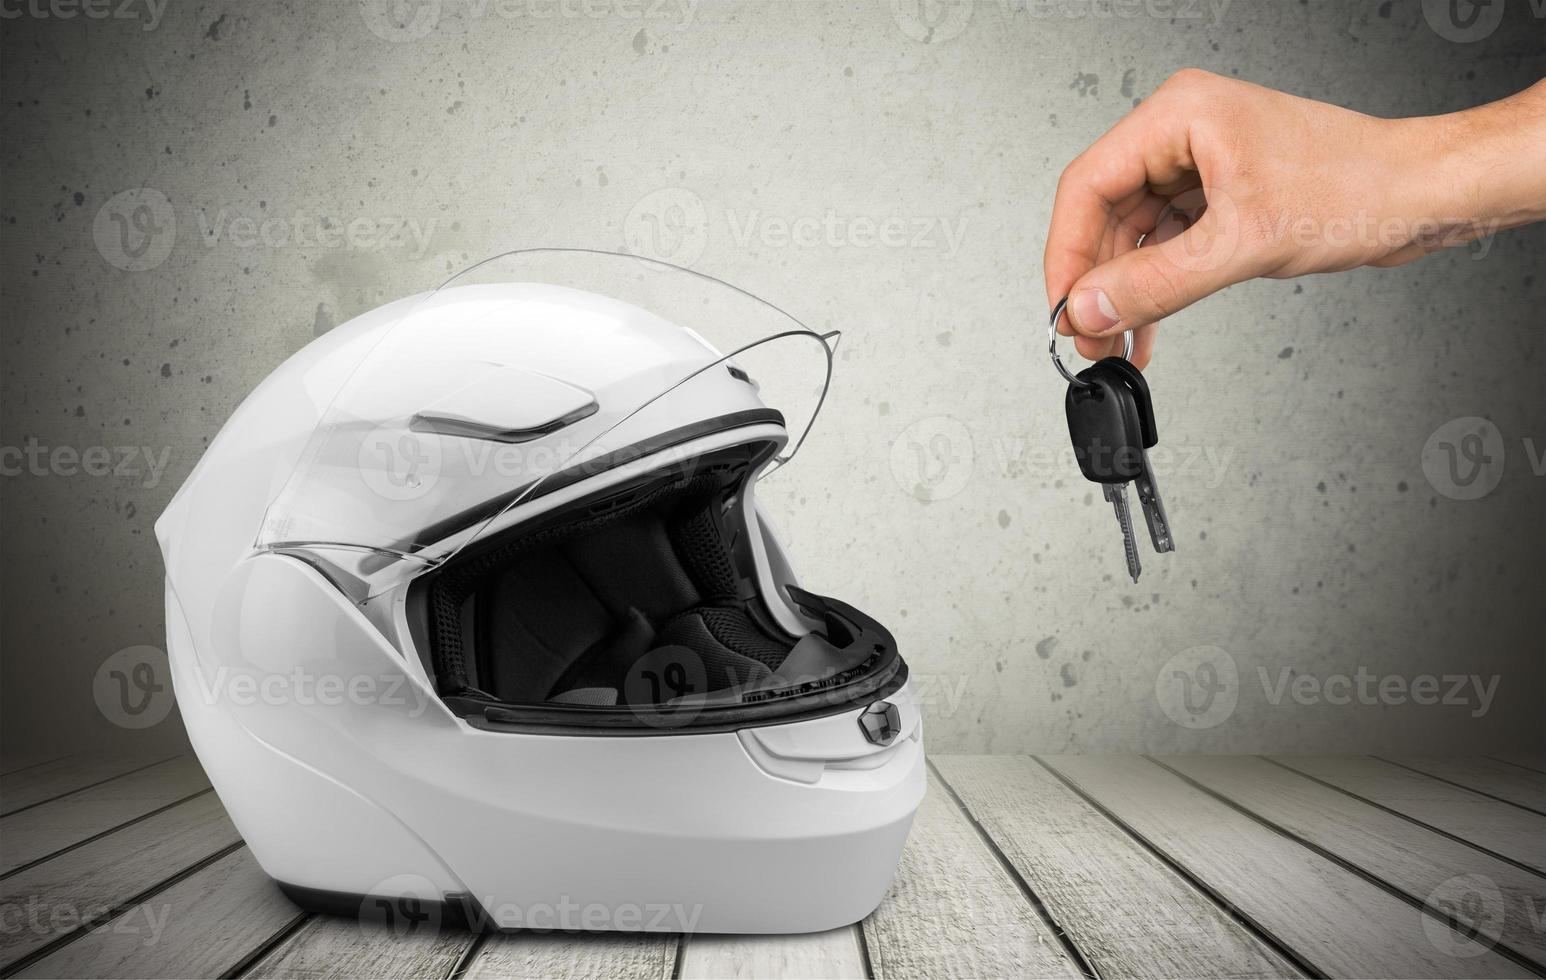 Helmet, Motorcycle, Crash Helmet photo